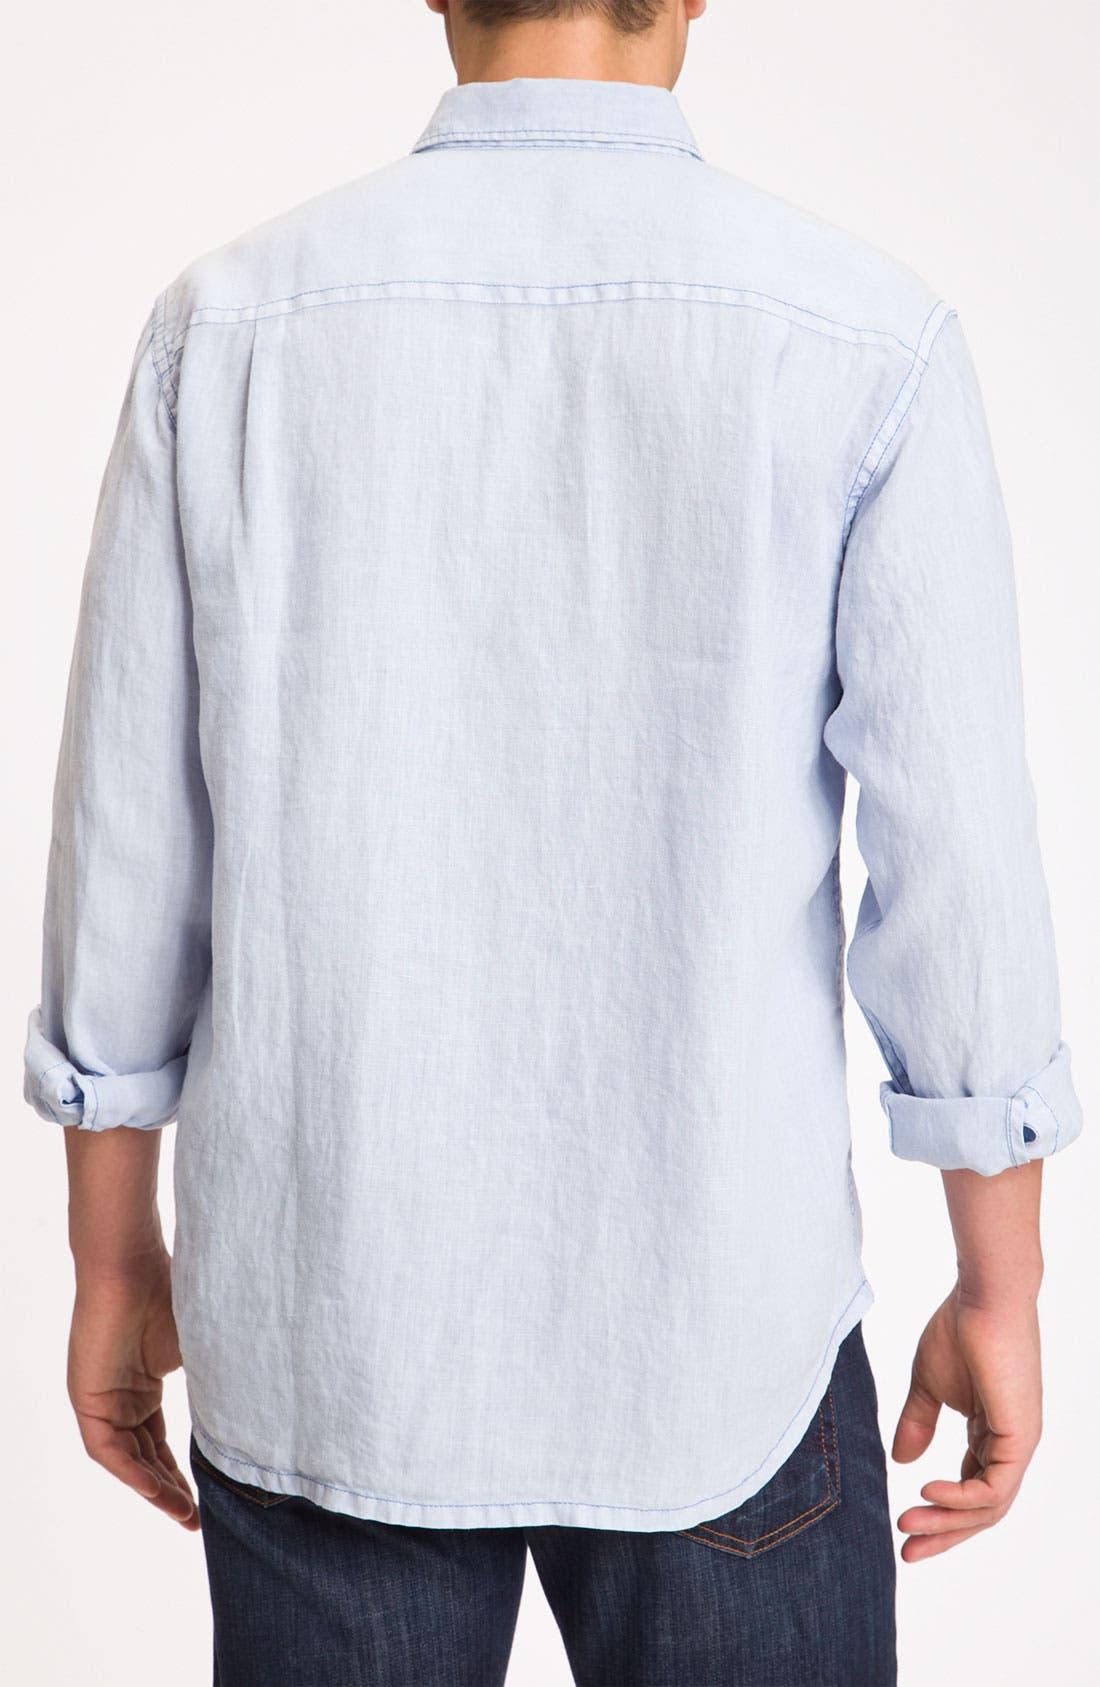 Alternate Image 2  - Tommy Bahama 'Beachy Breezer' Linen Sport Shirt (Big & Tall)